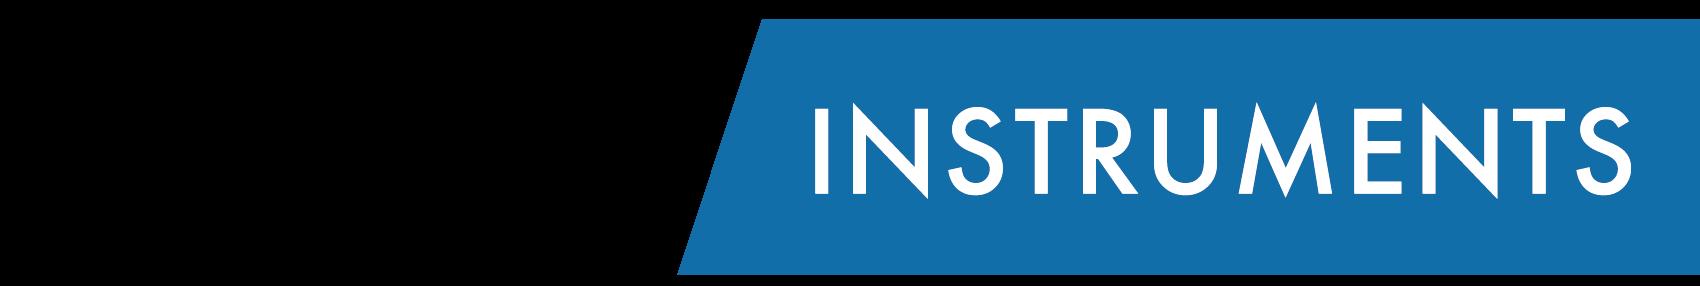 GLW Instruments-logo-cmyk